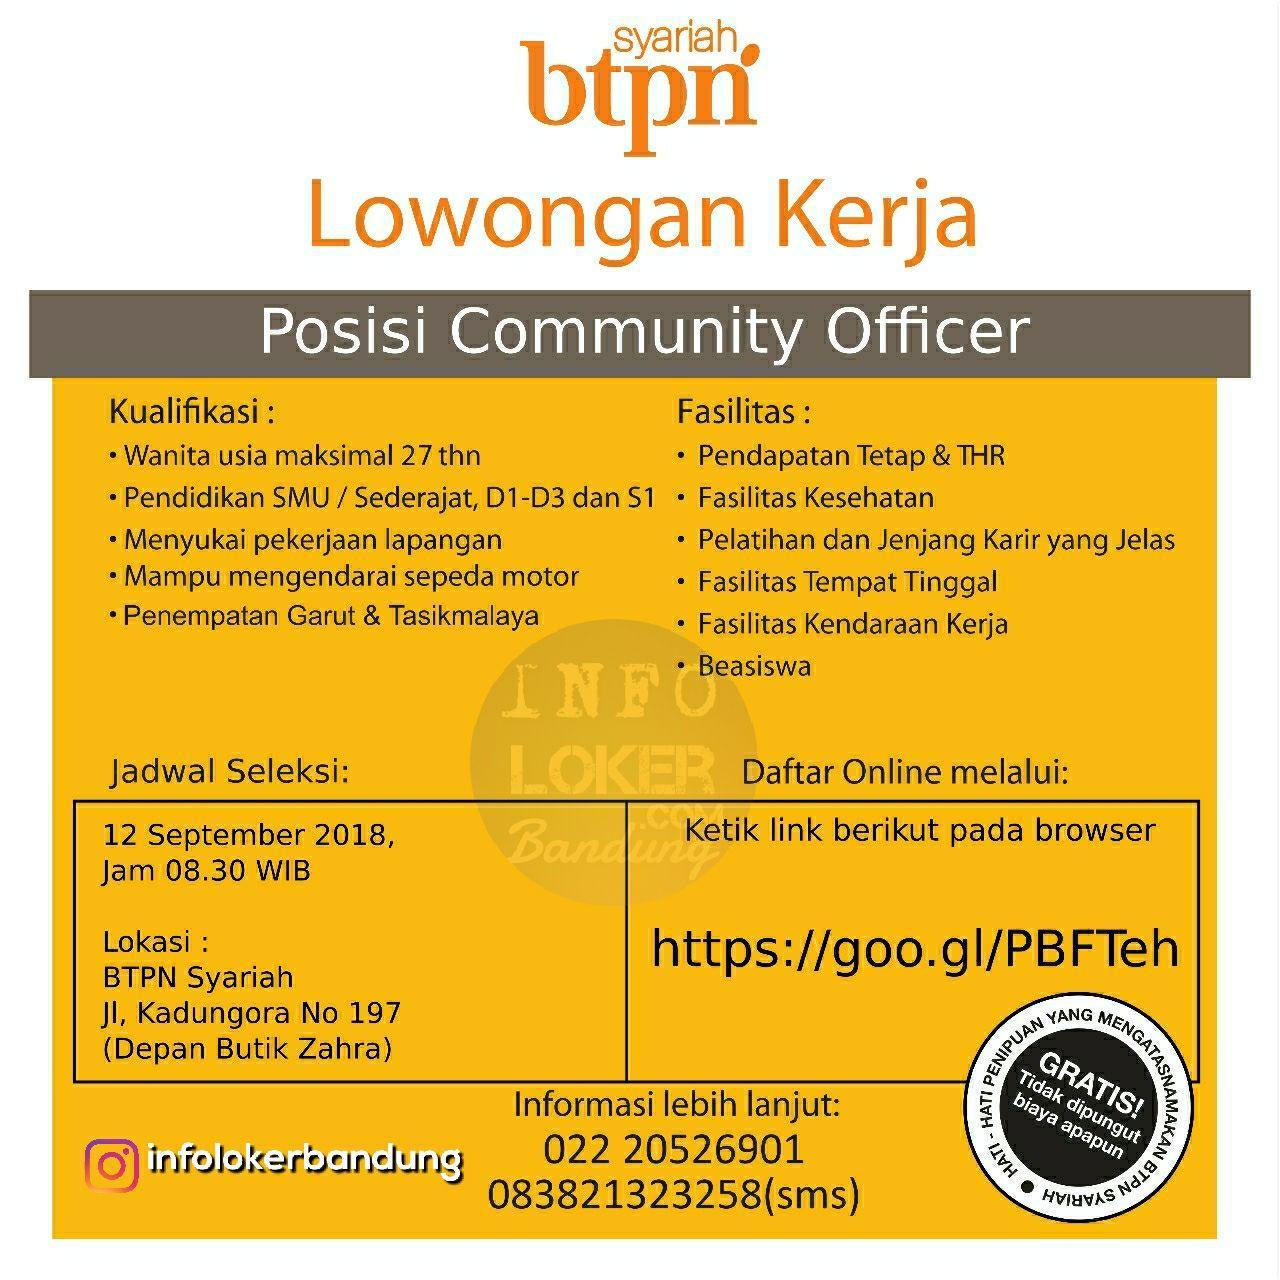 Lowongan Kerja Bank BTPN Syariah ( Walk In Interview ) 12 September 2018 Garut